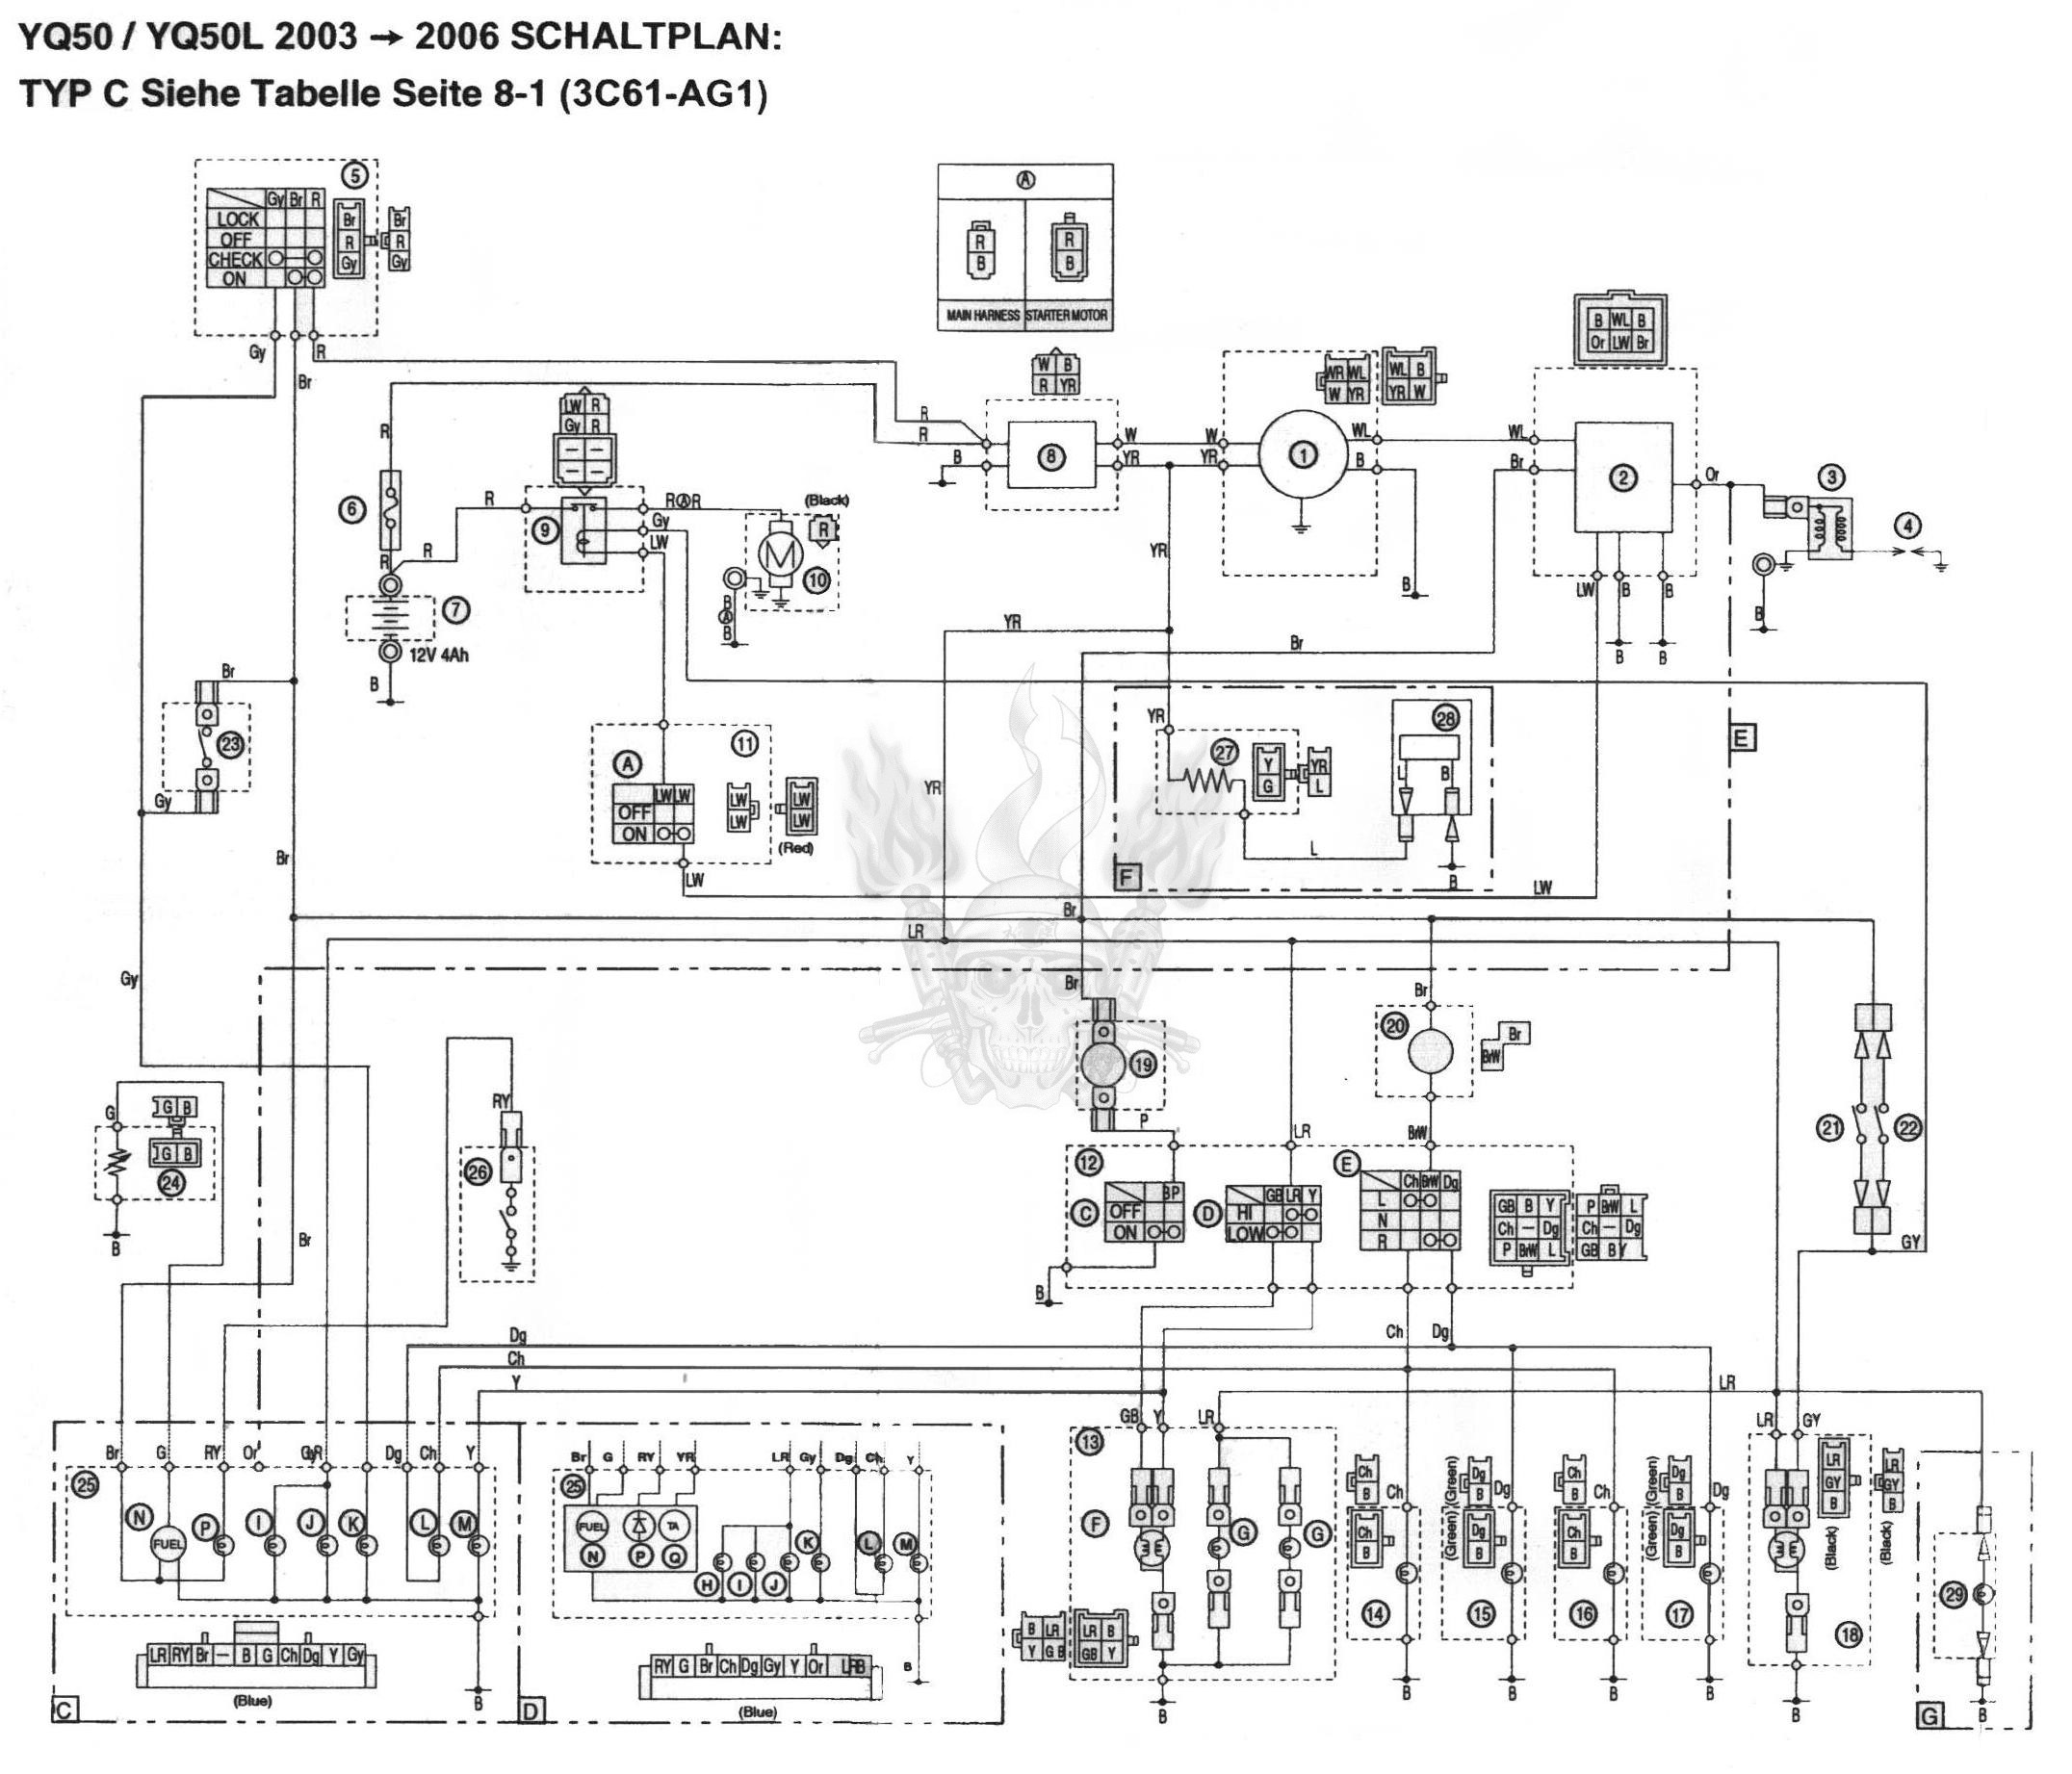 Схема электрооборудования скутеров Yamaha Aerox 2003